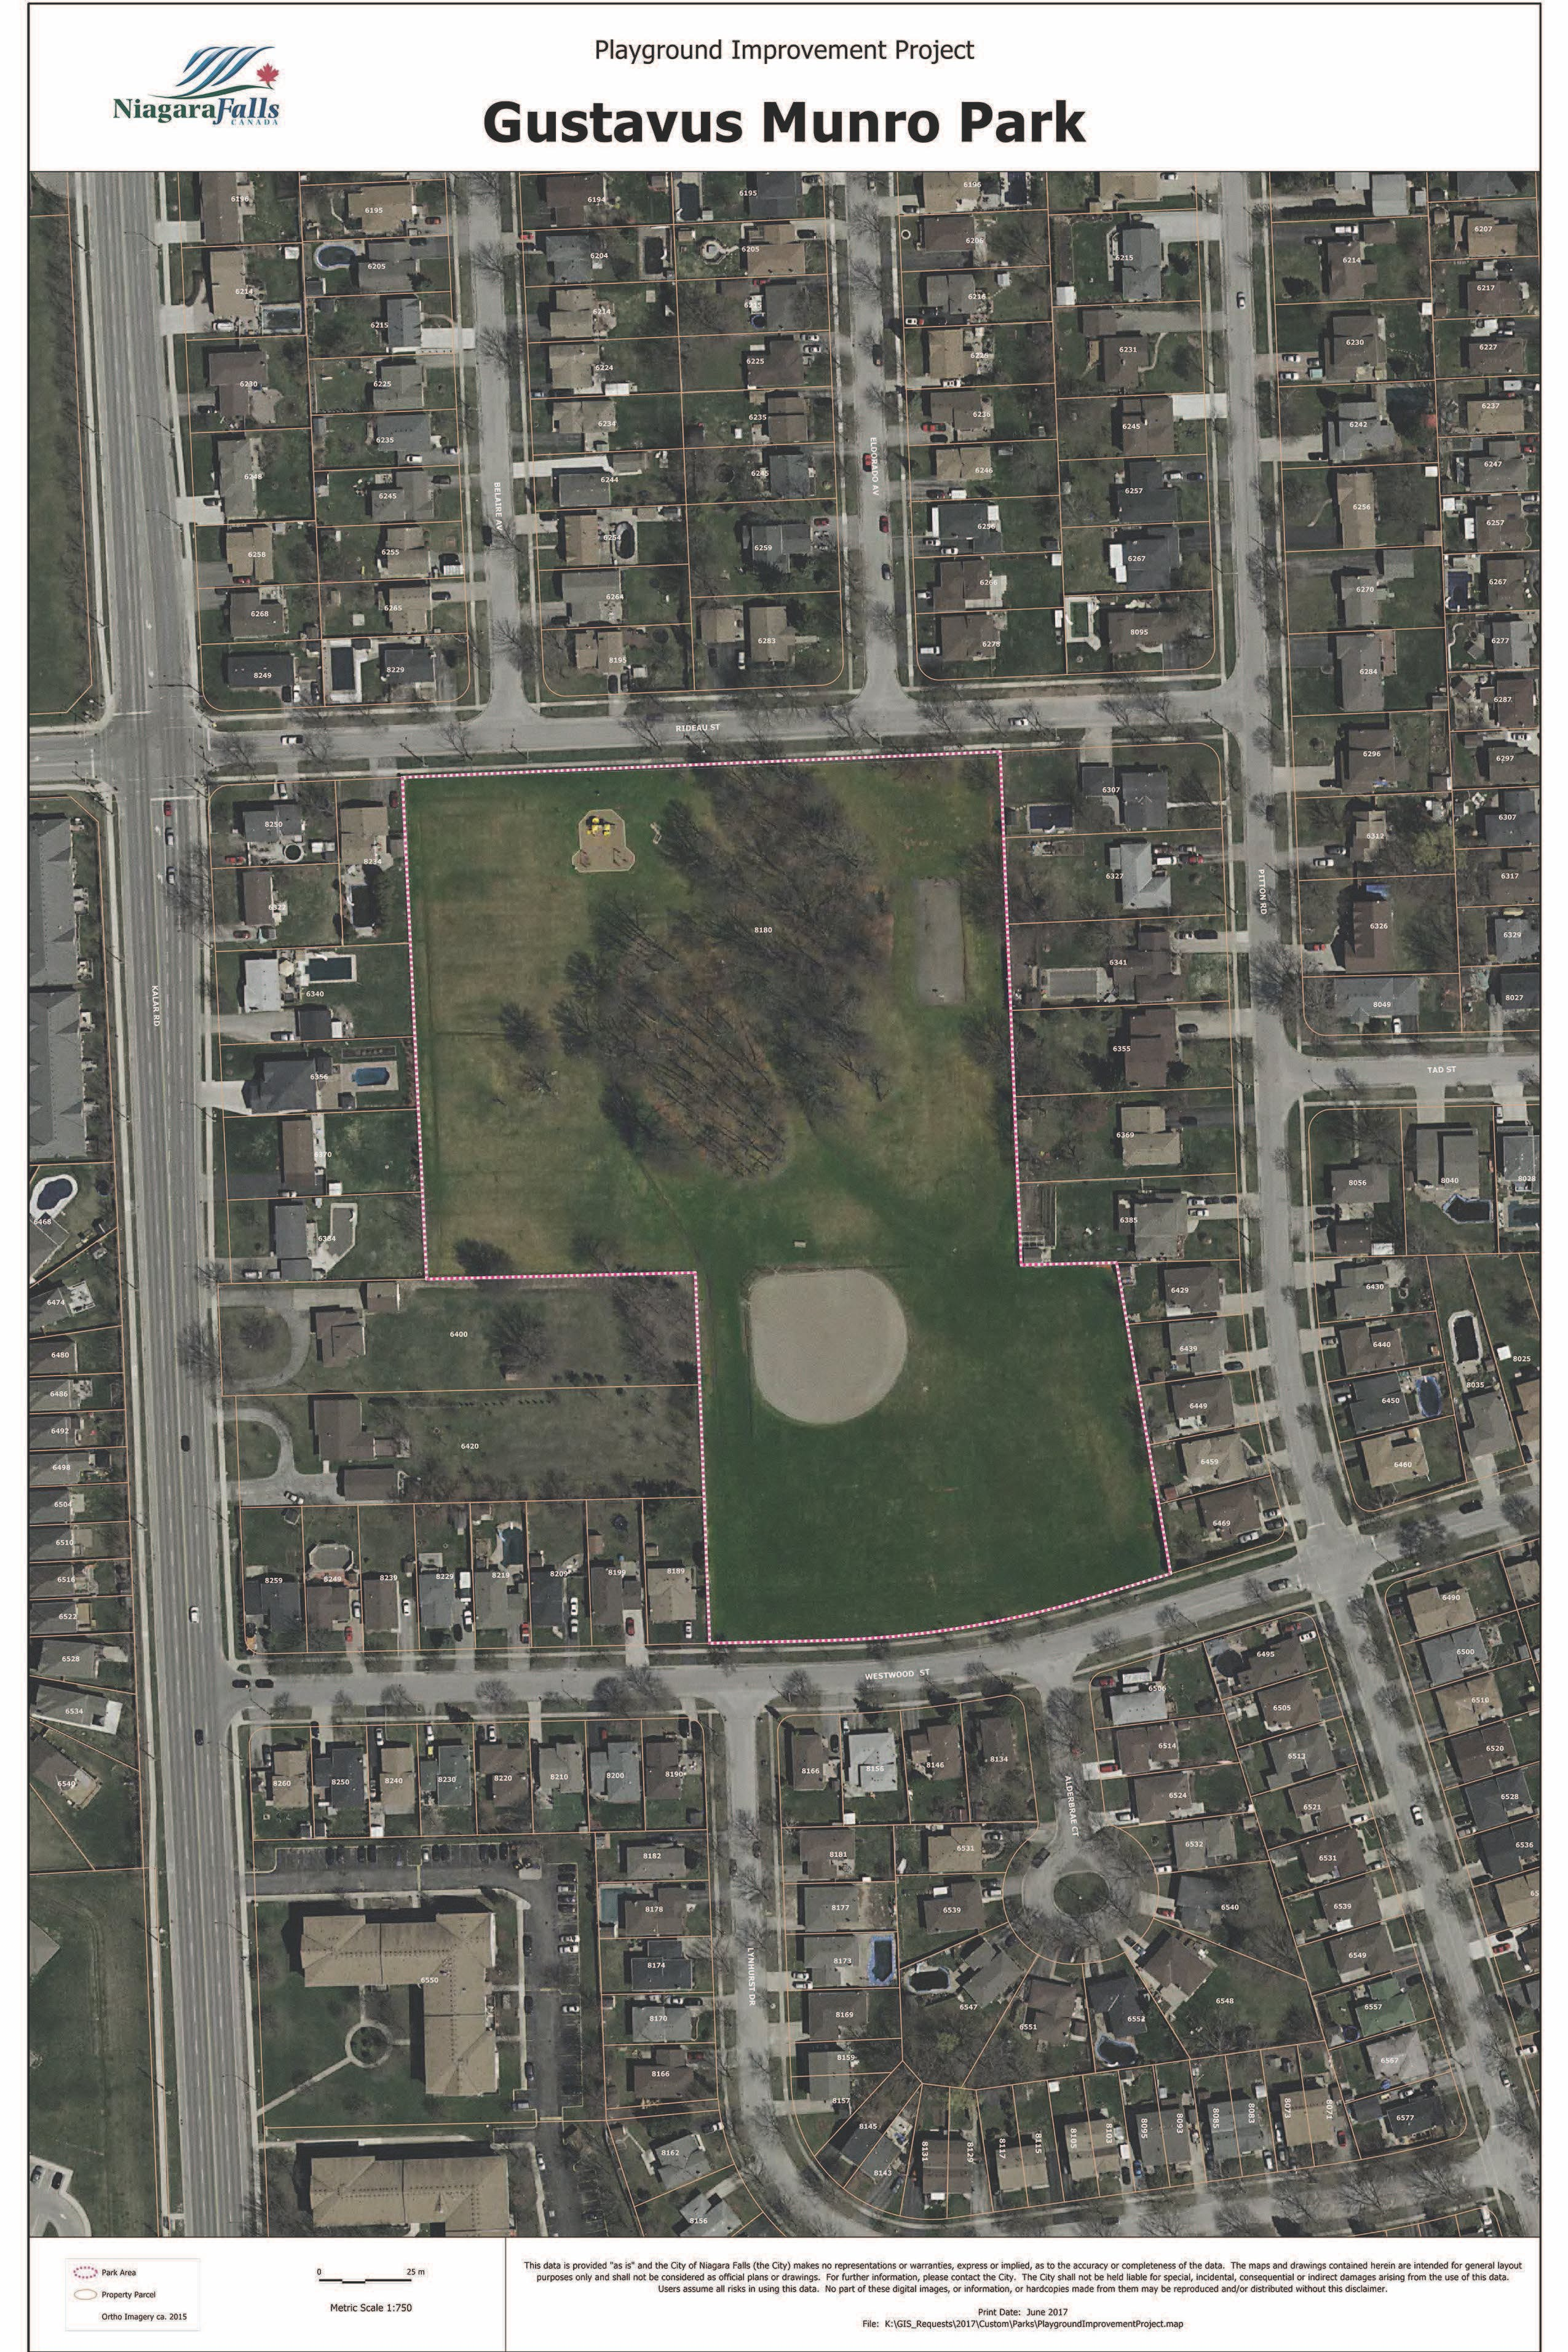 Gustavus Munro Park Plan